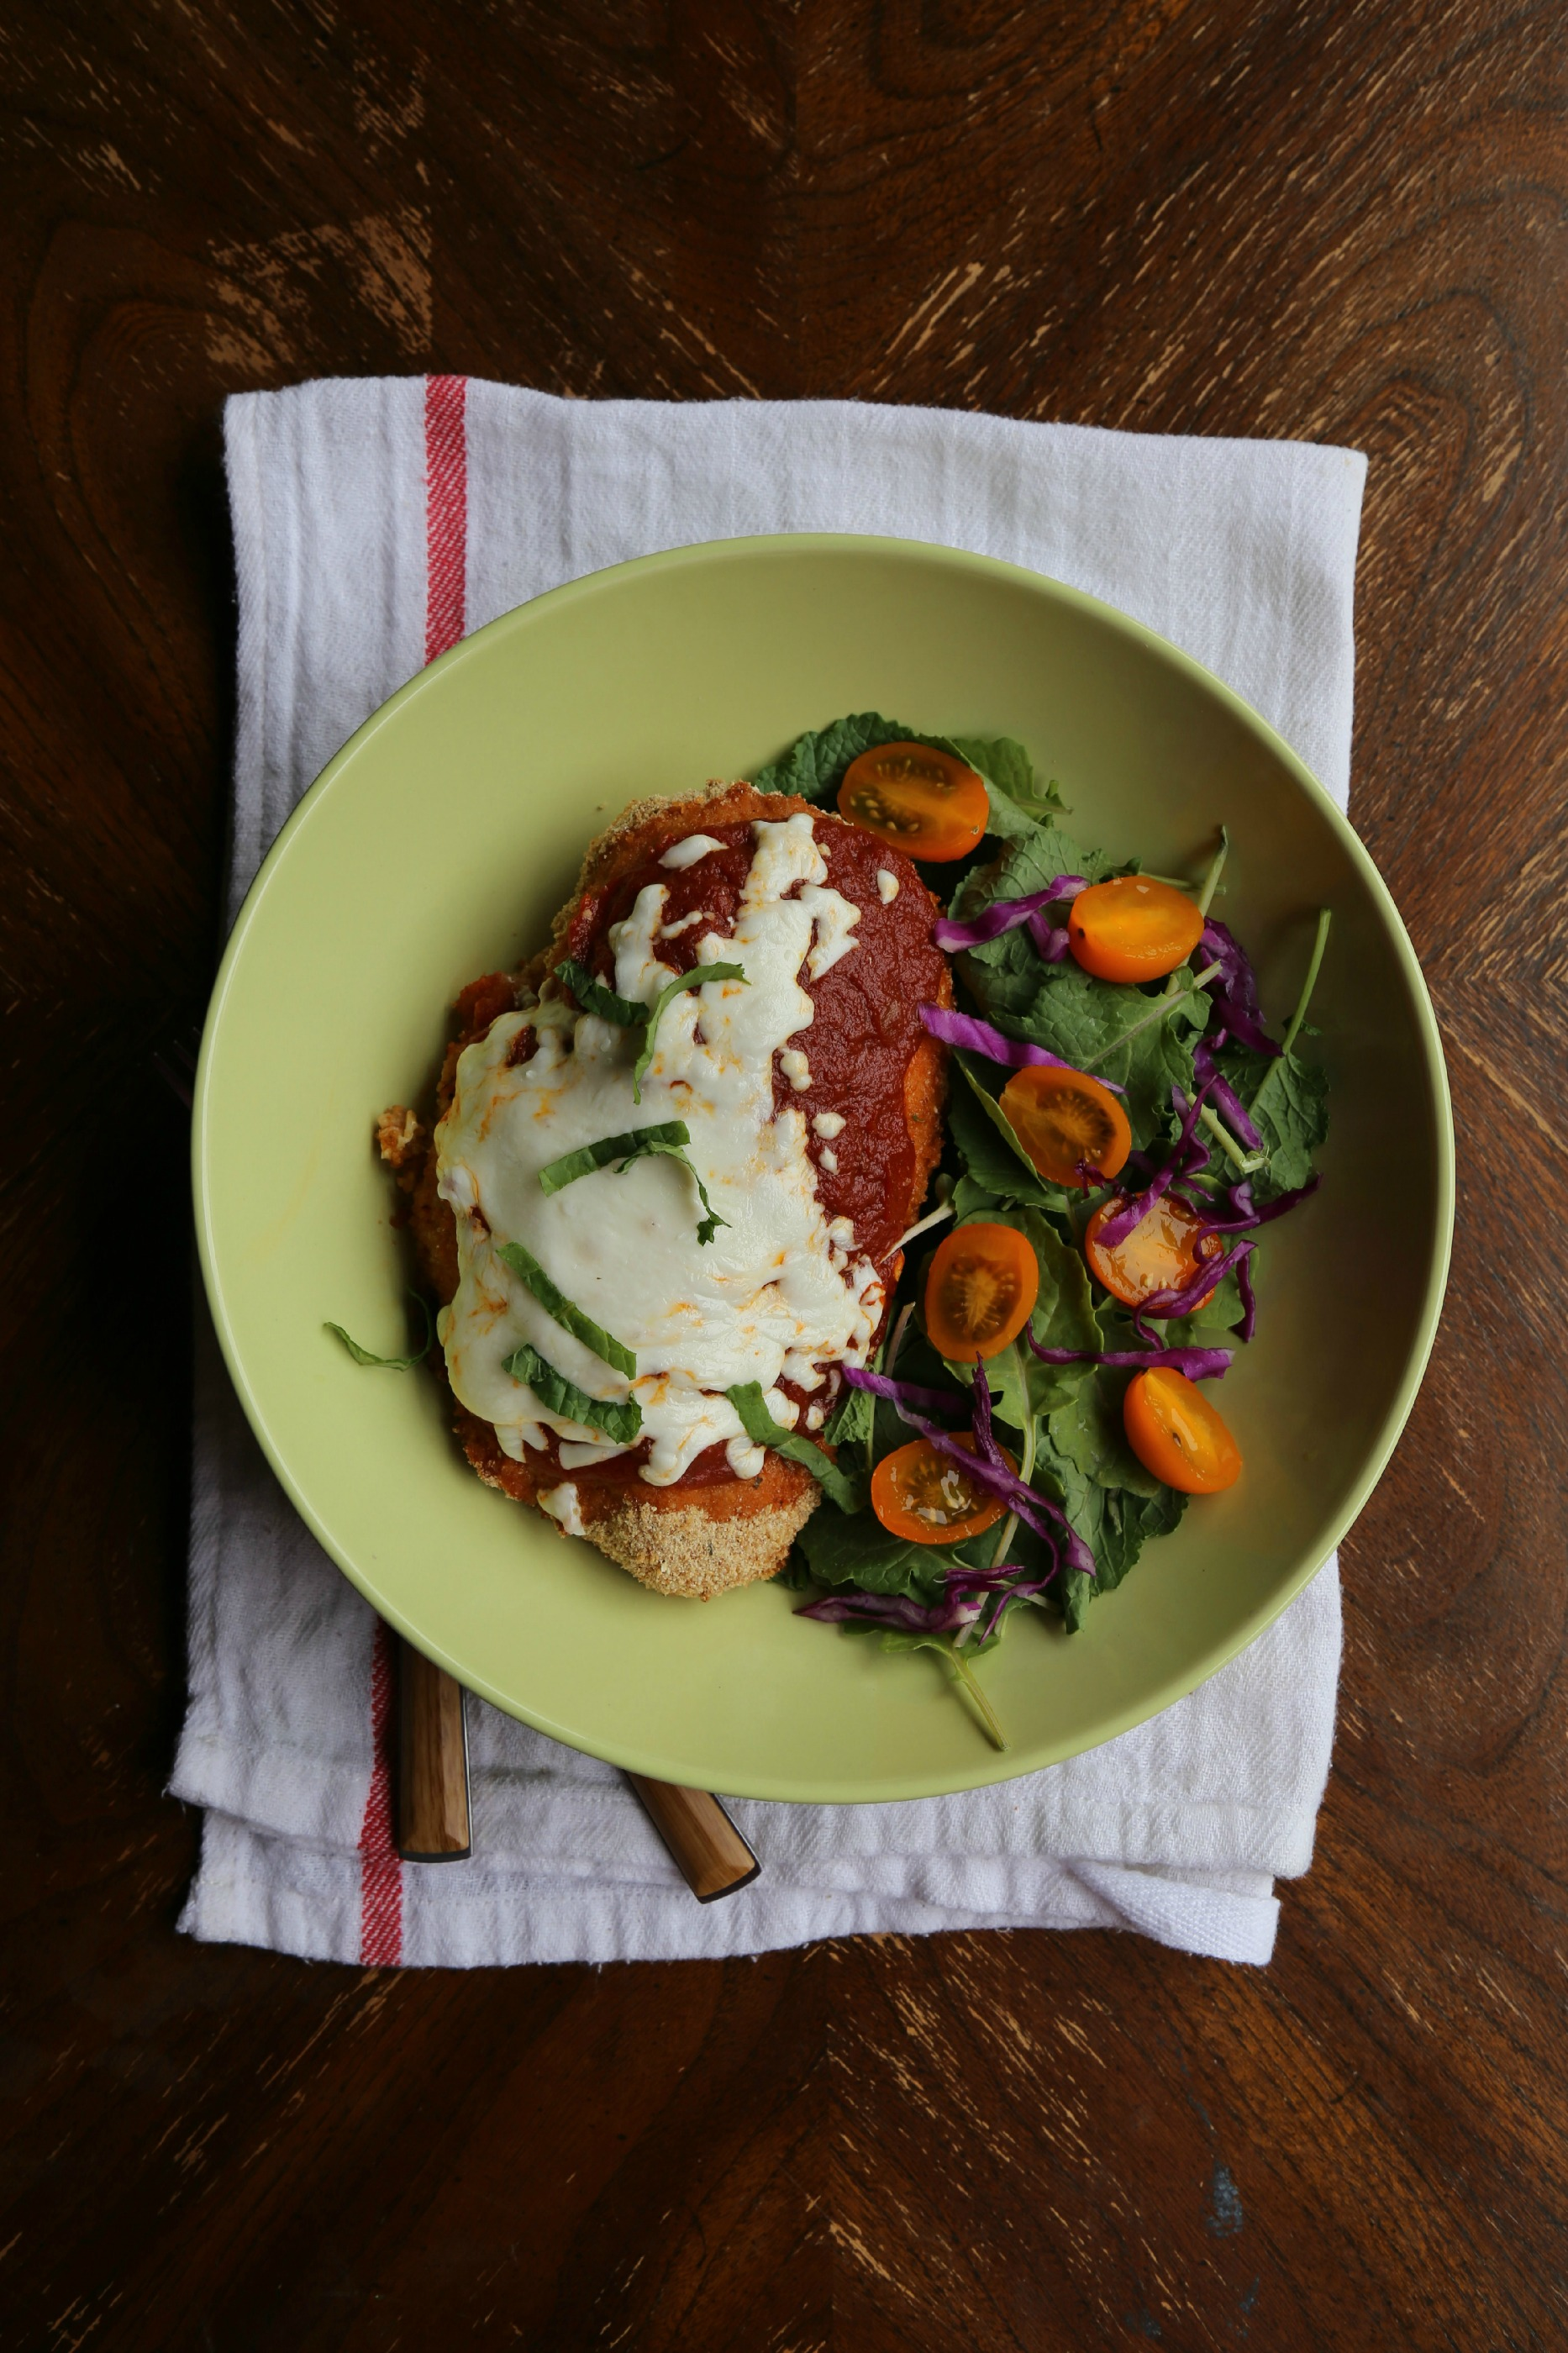 oven-baked-chicken-parm-VianneyRodriguez